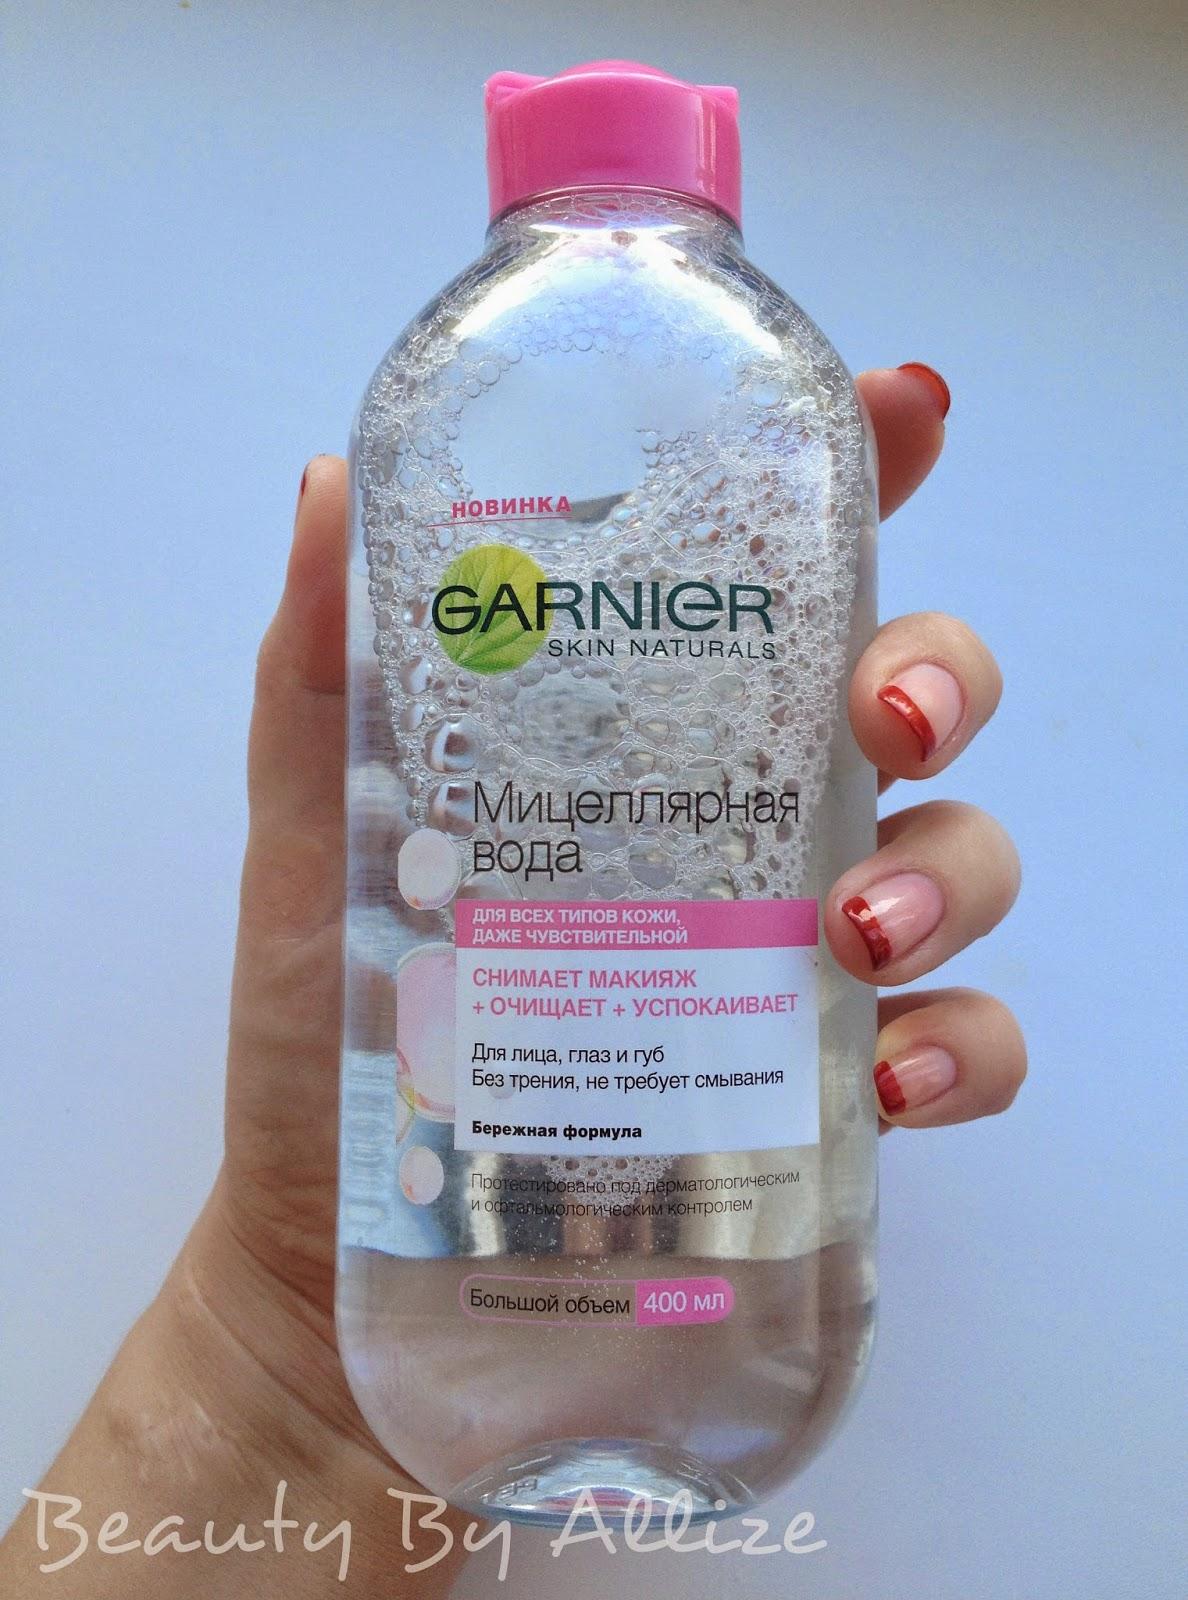 Мицеллярная вода от Garnier. Уход